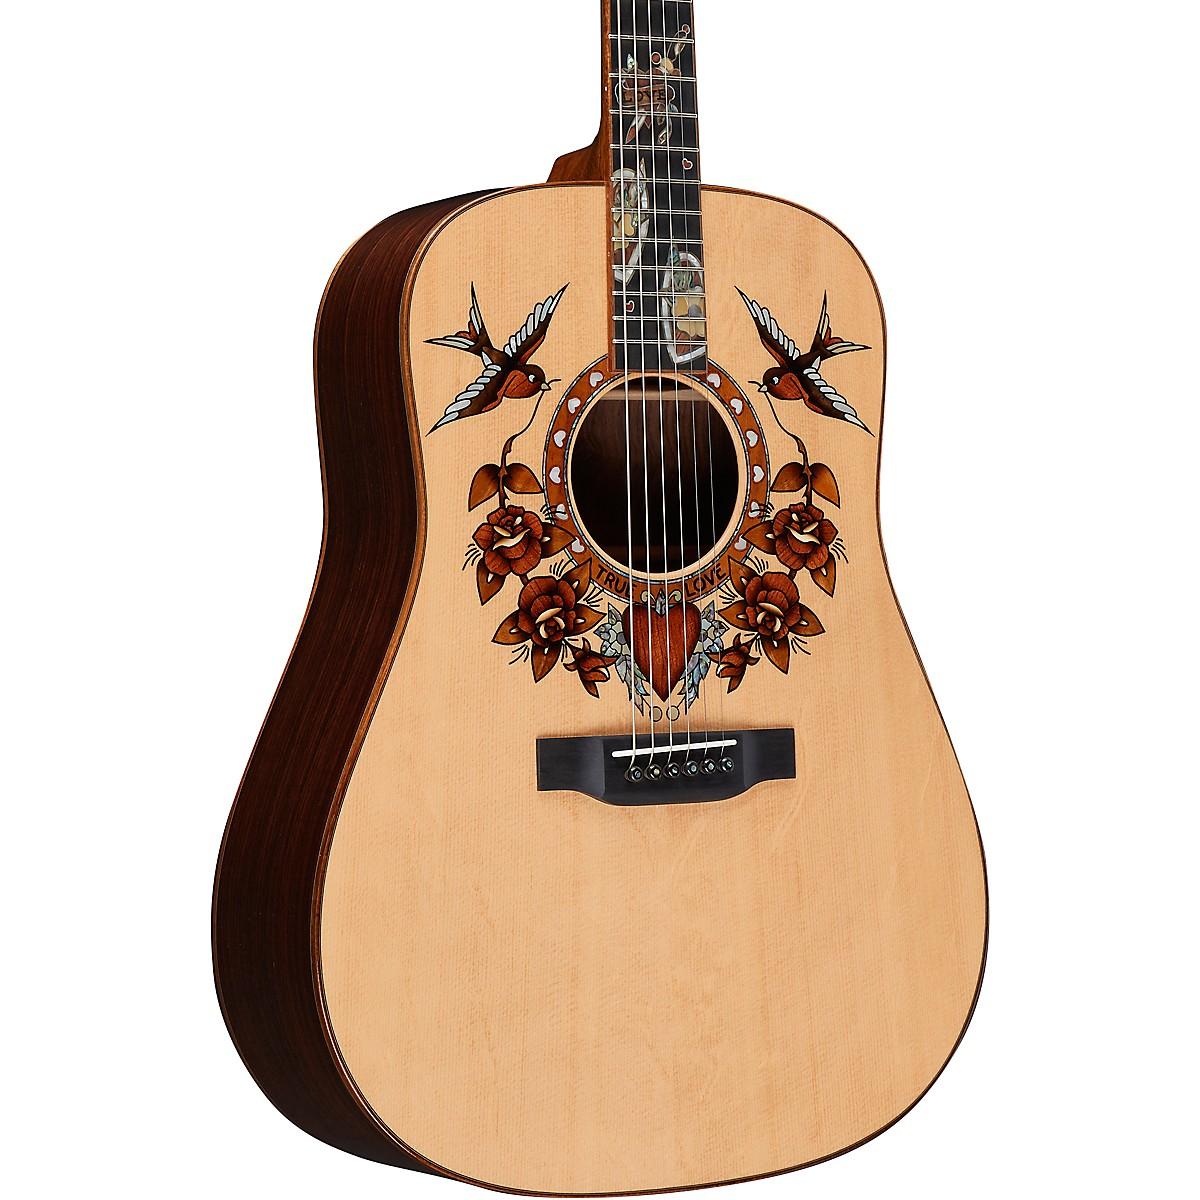 Martin True Love Sailor Jerry Dreadnought Acoustic Guitar